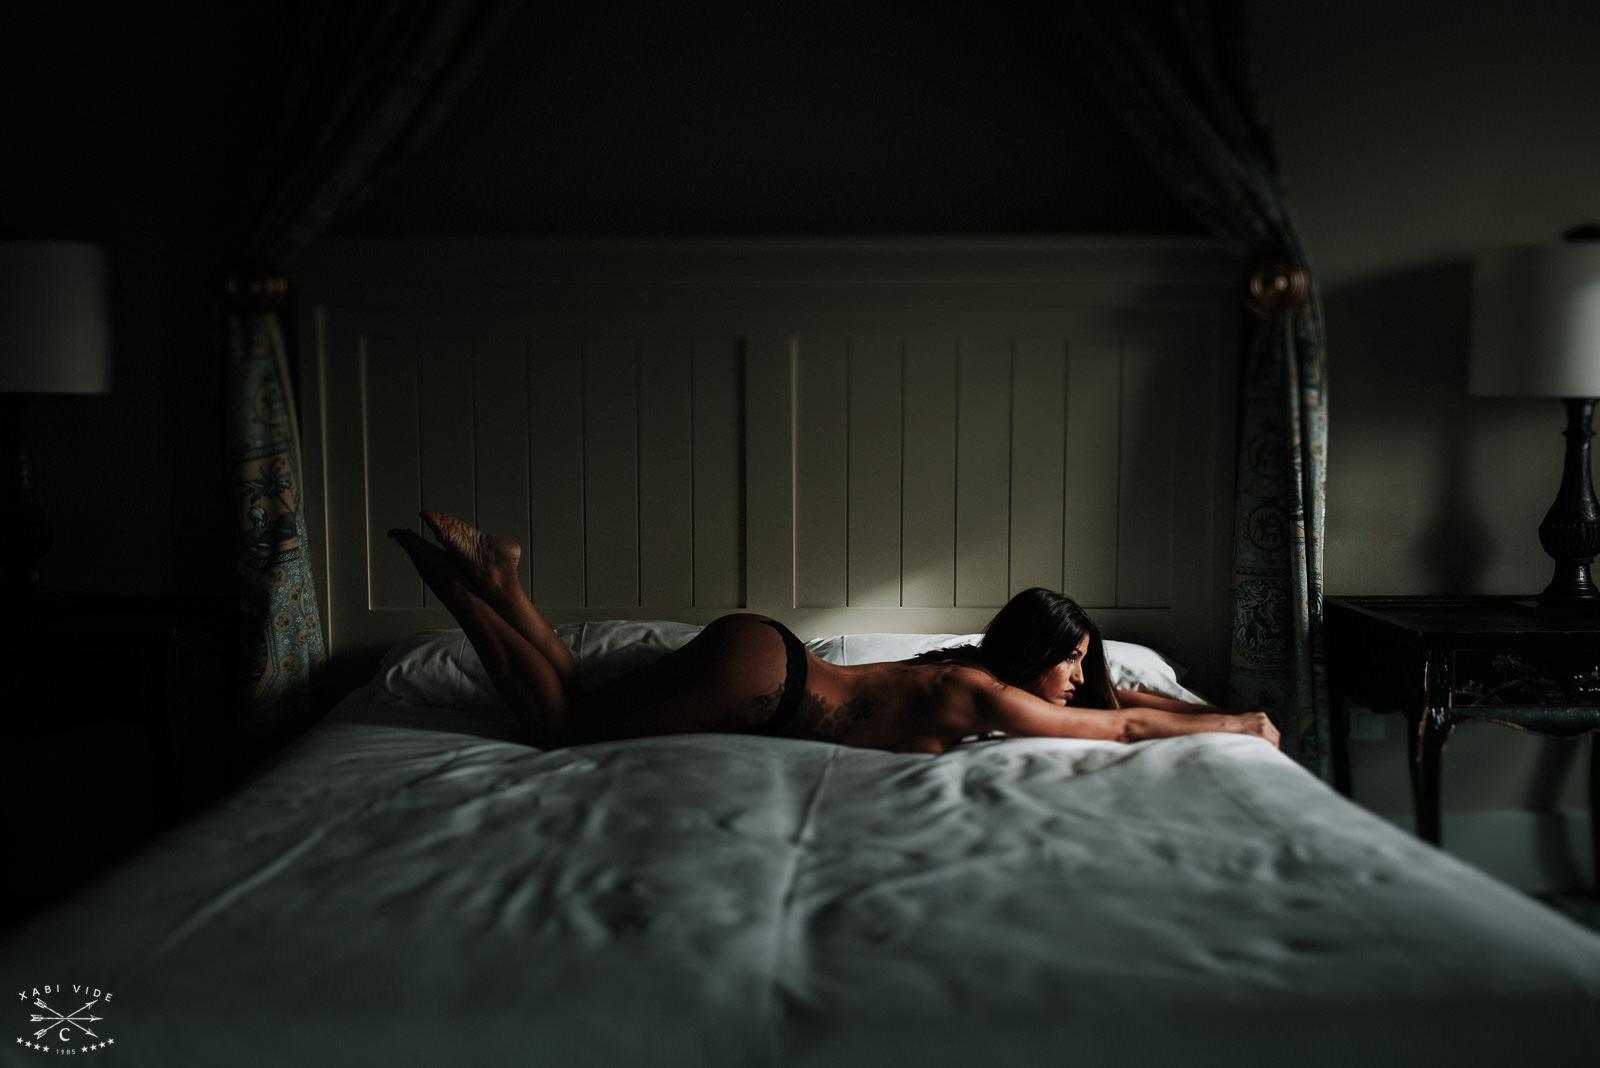 fotografía boudoir-26